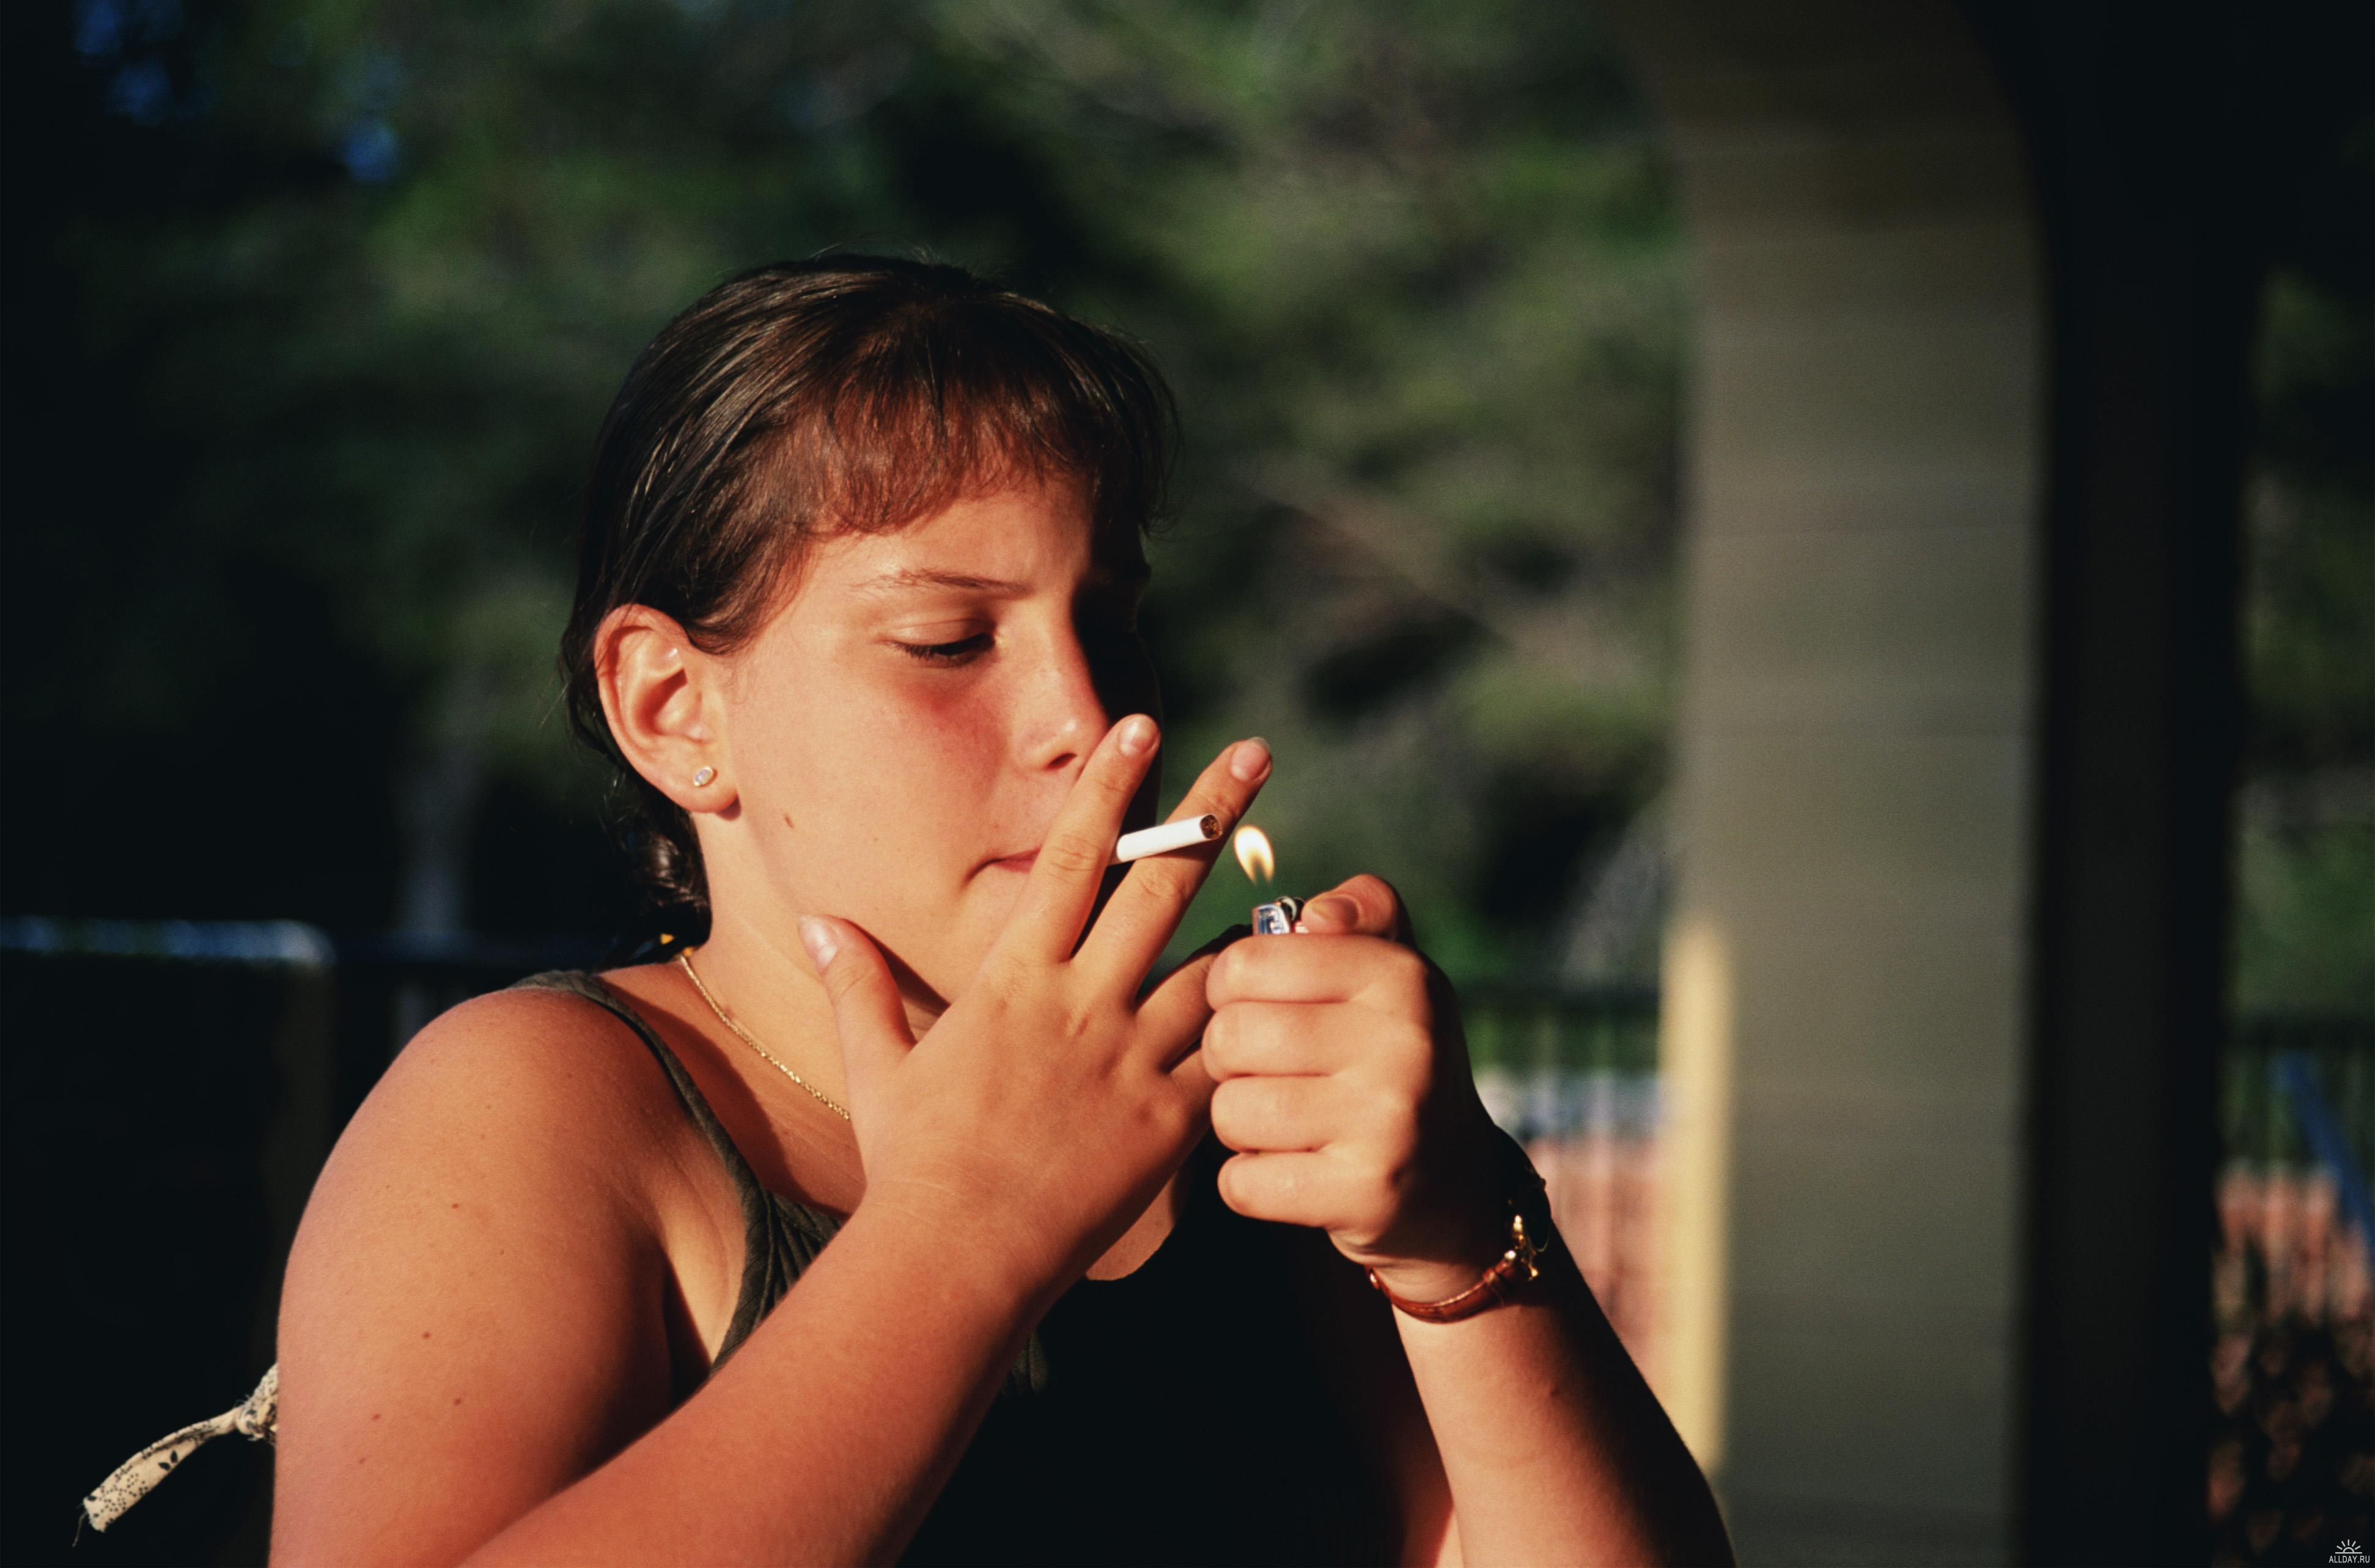 Быстрый способ бросить курить аллен карр аудиокнига торрент